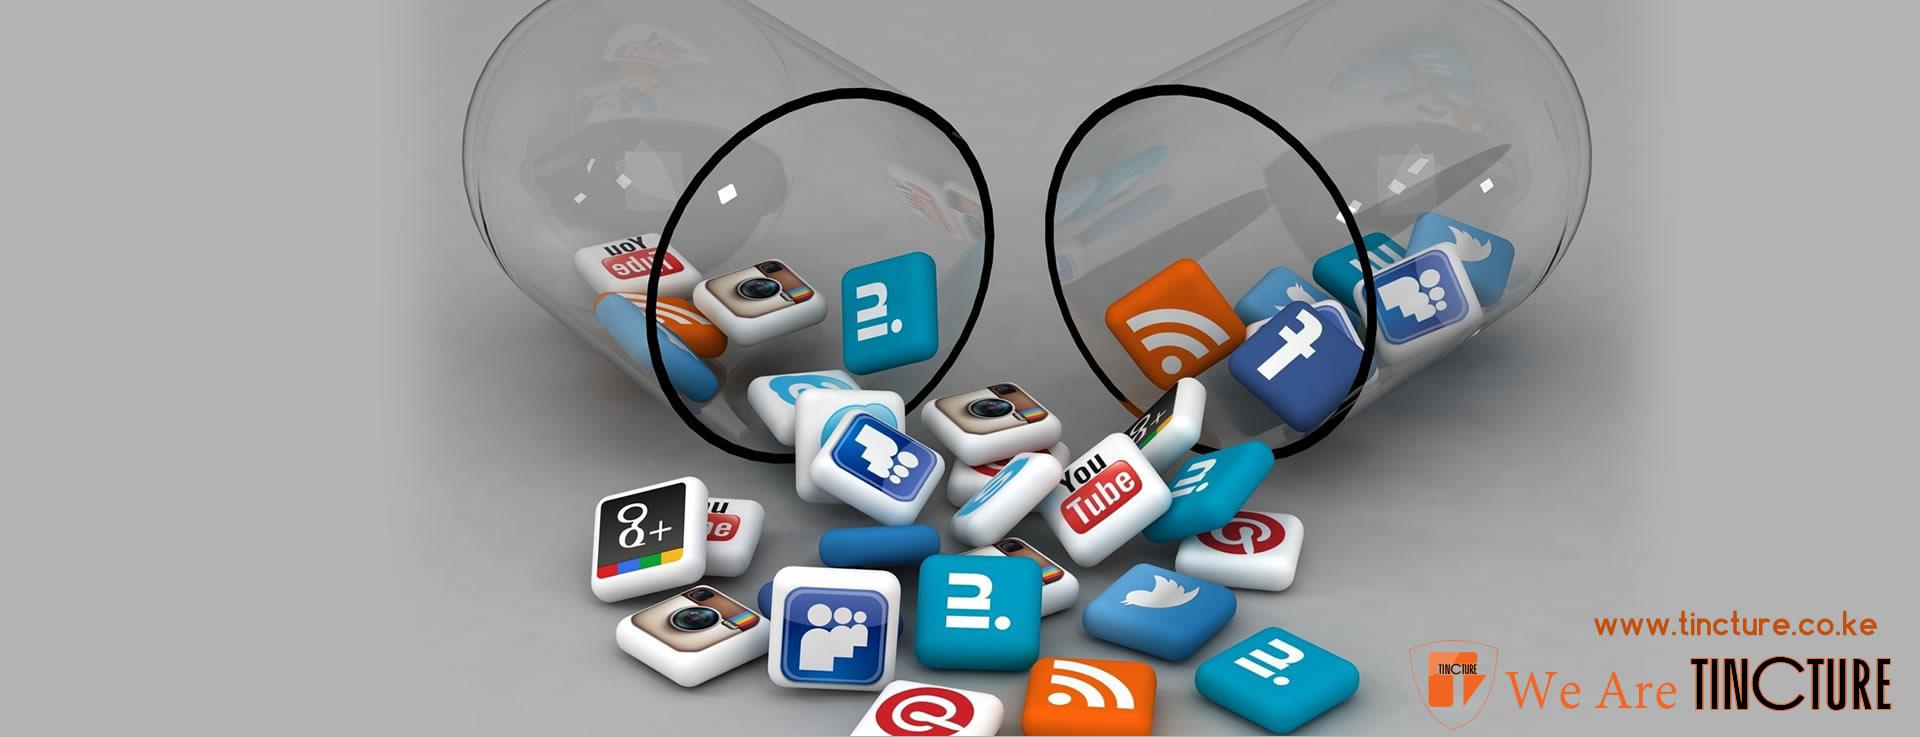 We are Tincture! A Premier Social Media & Digital Branding Agency